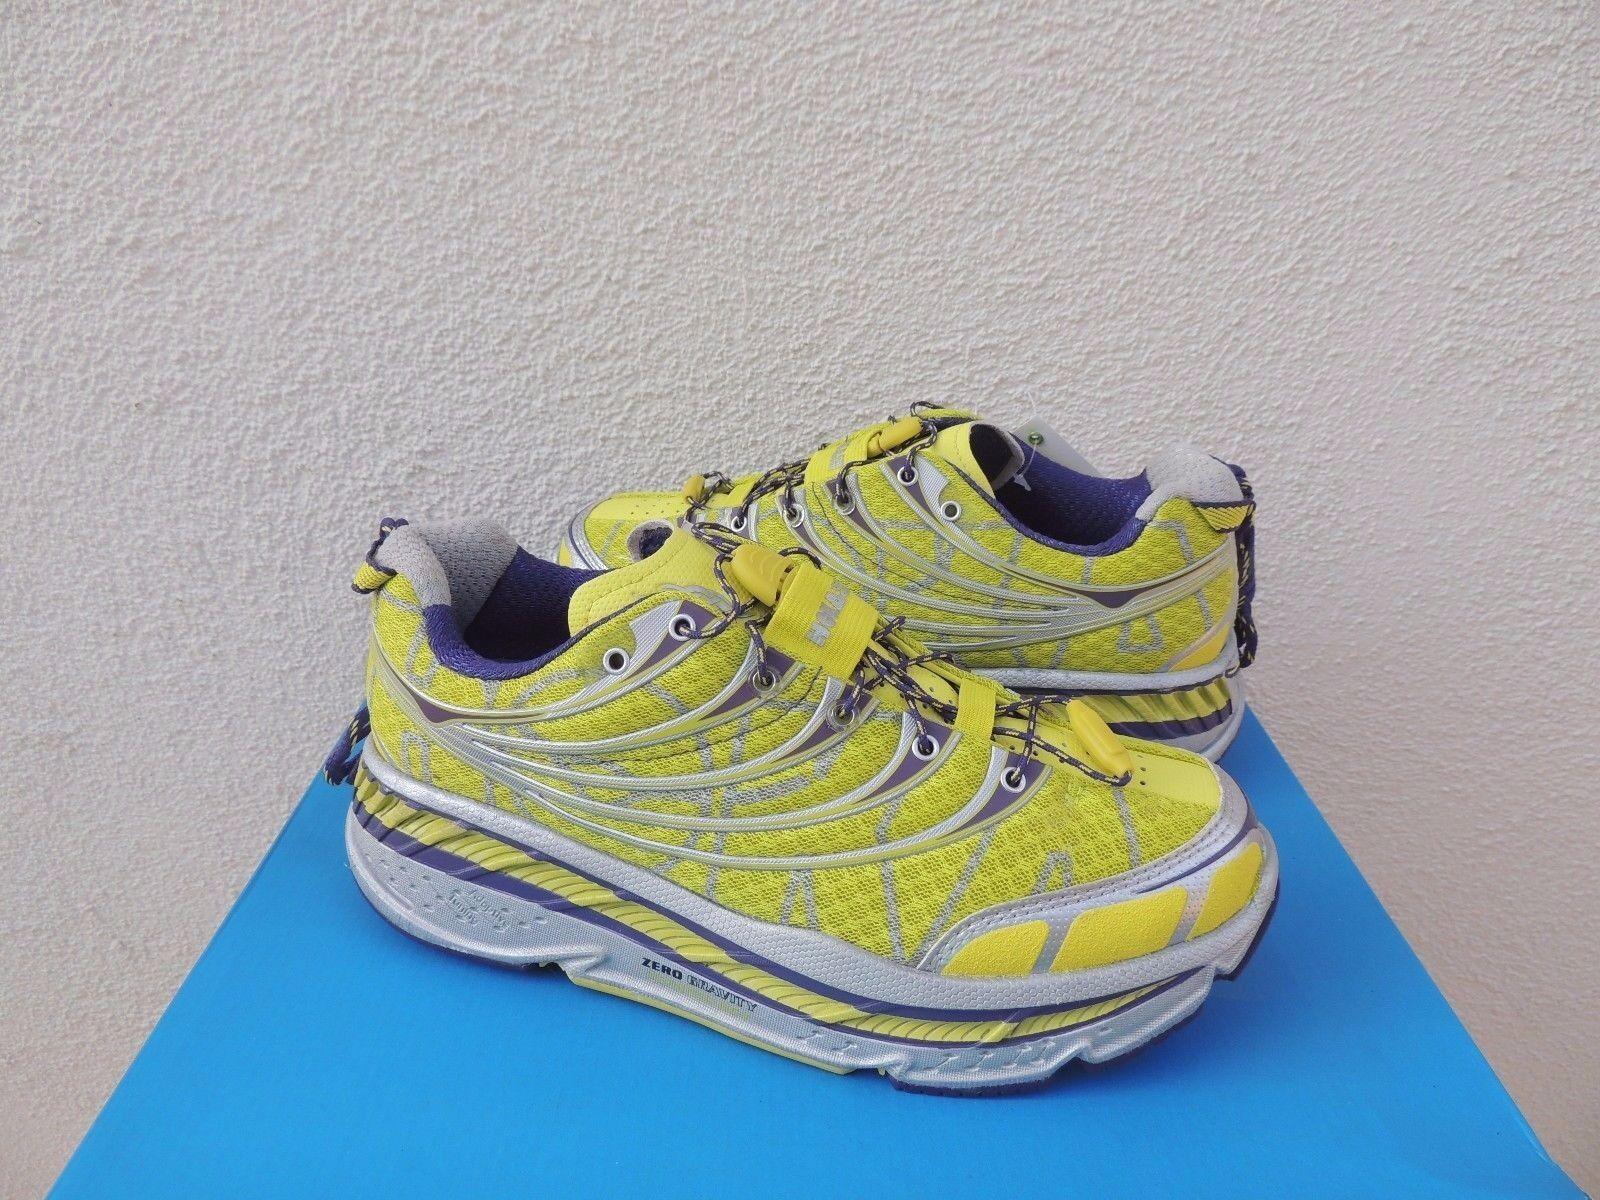 HOKA ONE ONE STINSON TARMAC 7.5/ CITRUS RUNNING Schuhe, US 7.5/ TARMAC EUR 39 1/3 NWT d85008